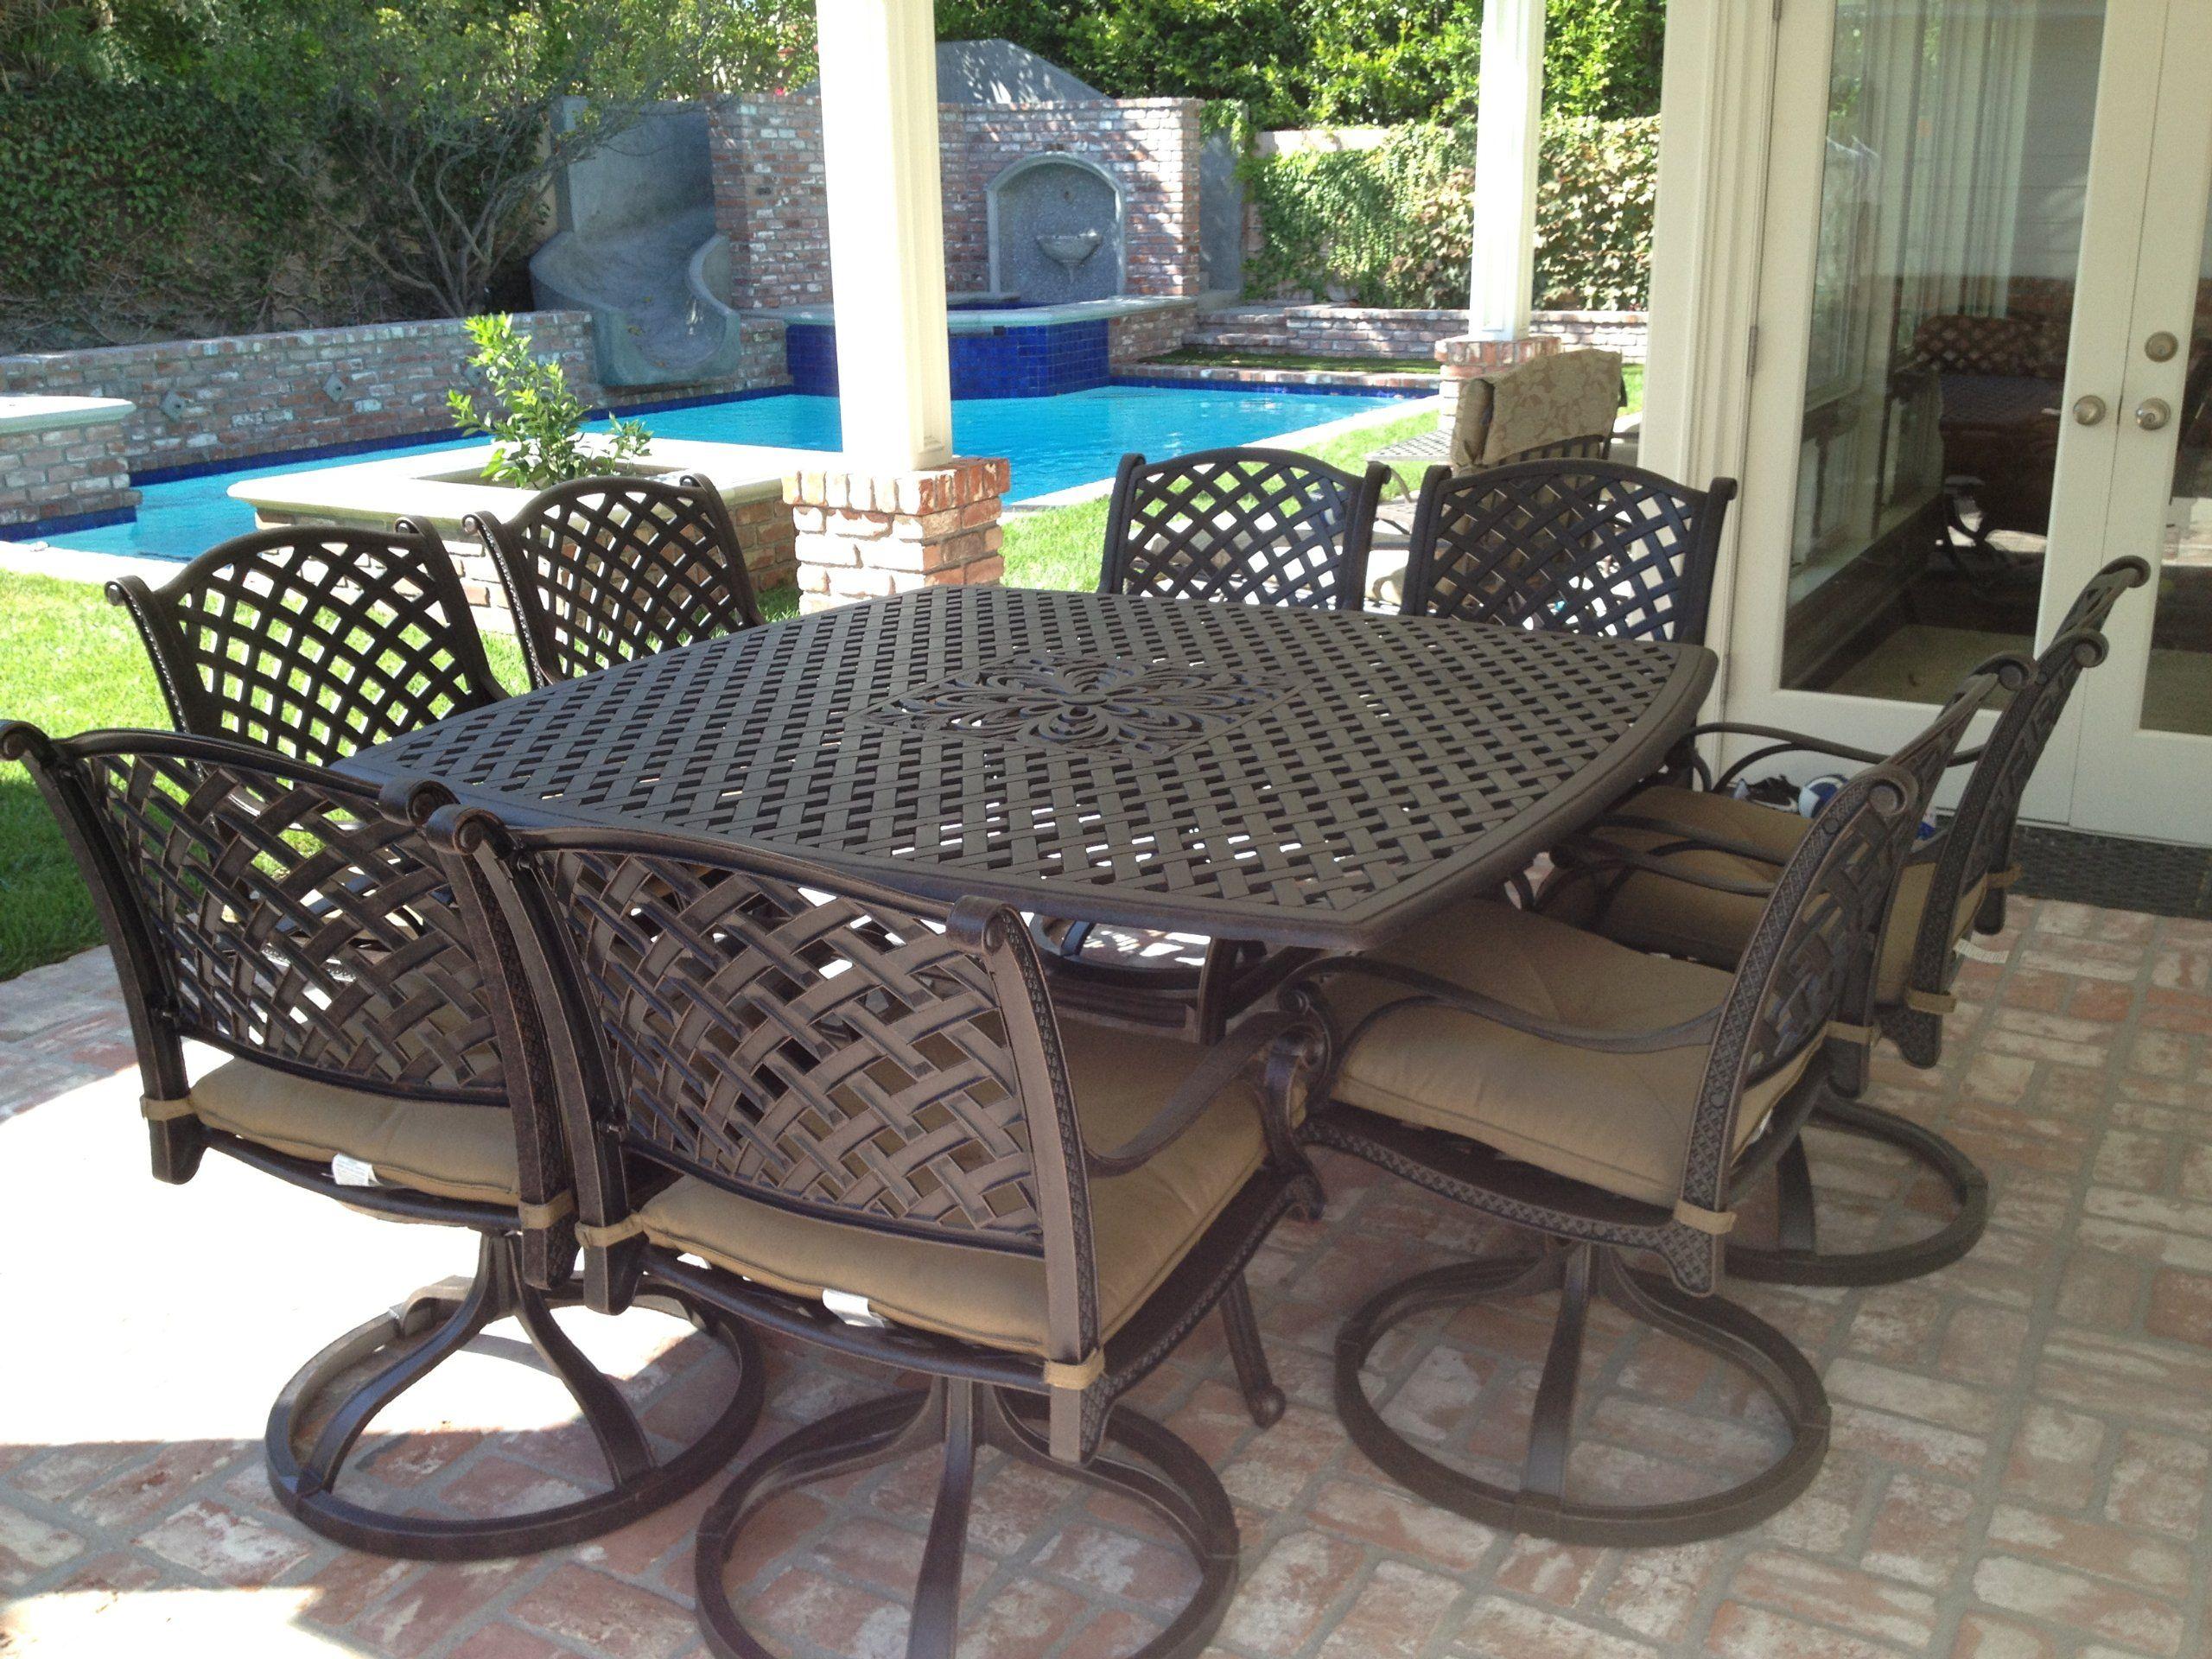 38+ Powder coating patio furniture near me info